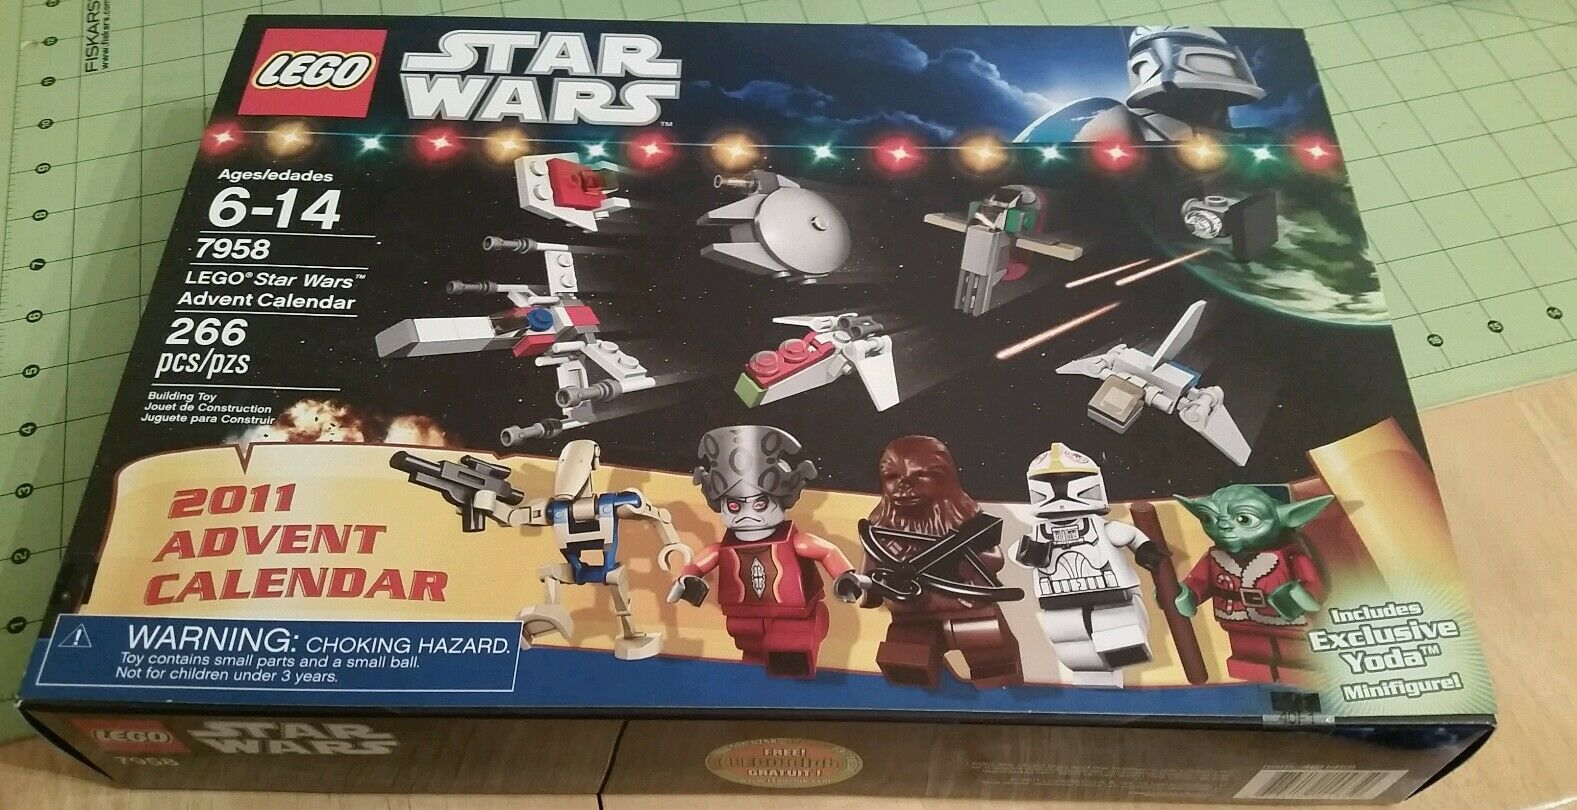 Lego 7958 Star Wars 2011 Advent Calendar New In Factory Sealed Box